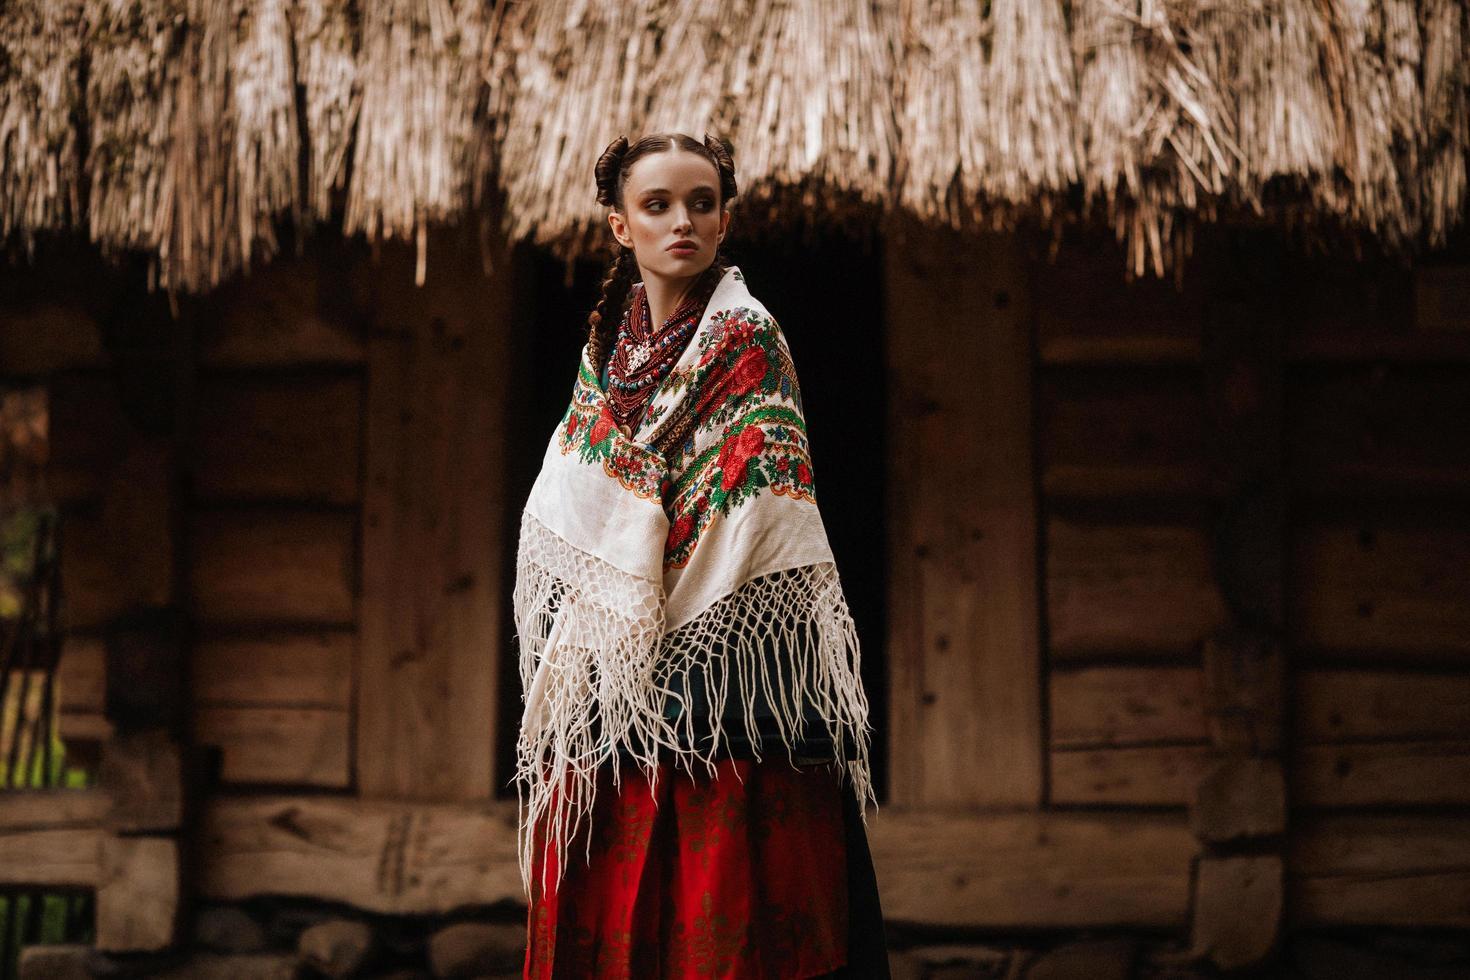 jeune fille pose en robe ukrainienne photo